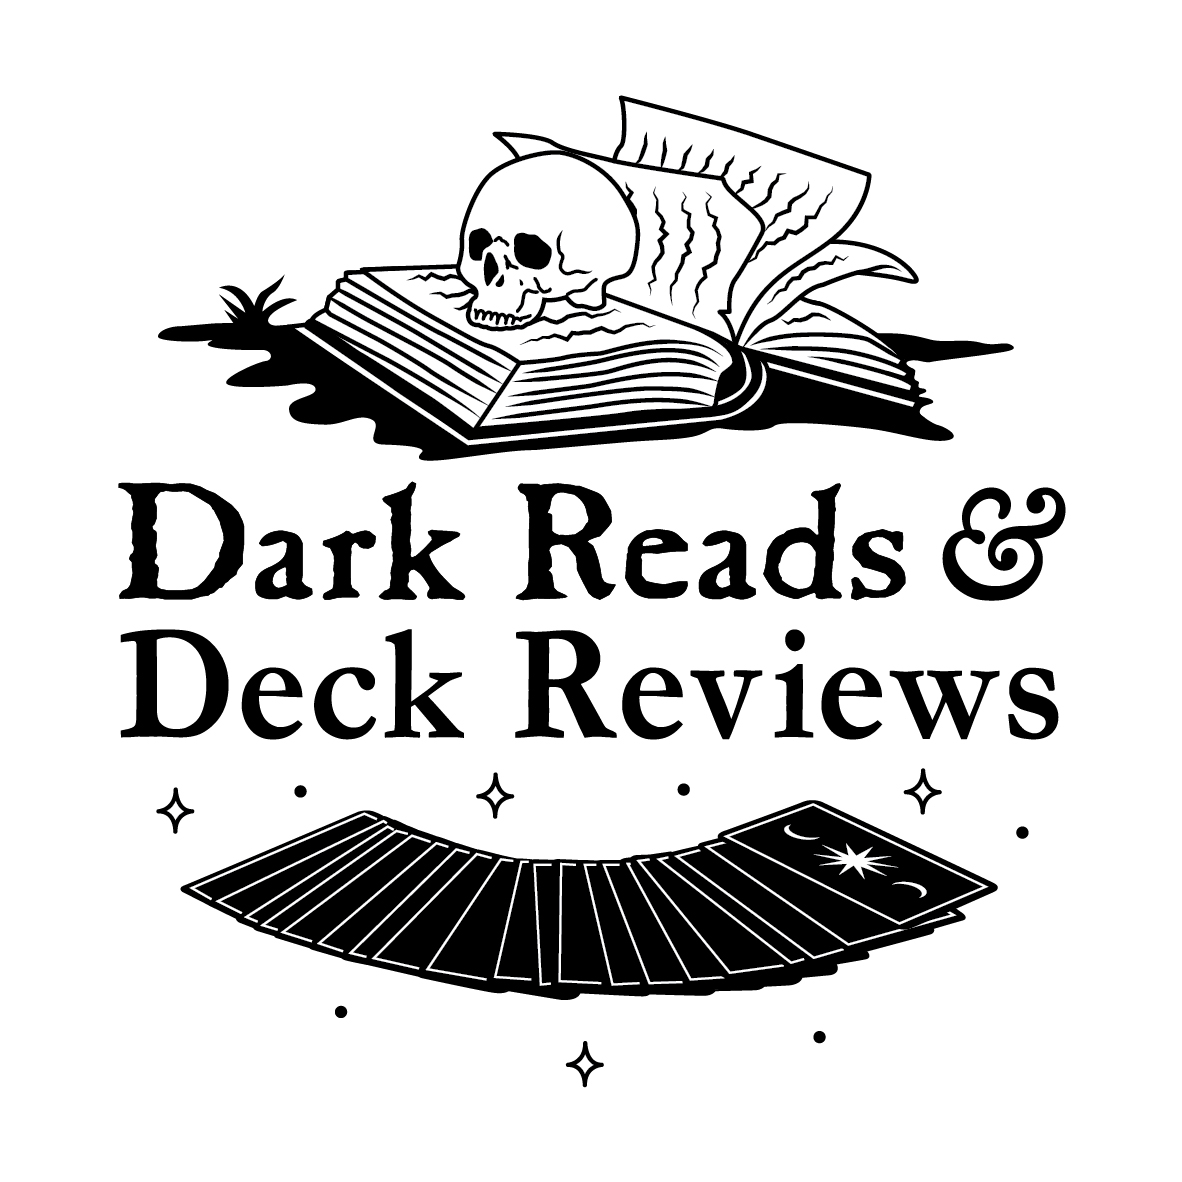 Dark Reads & Deck Reviews